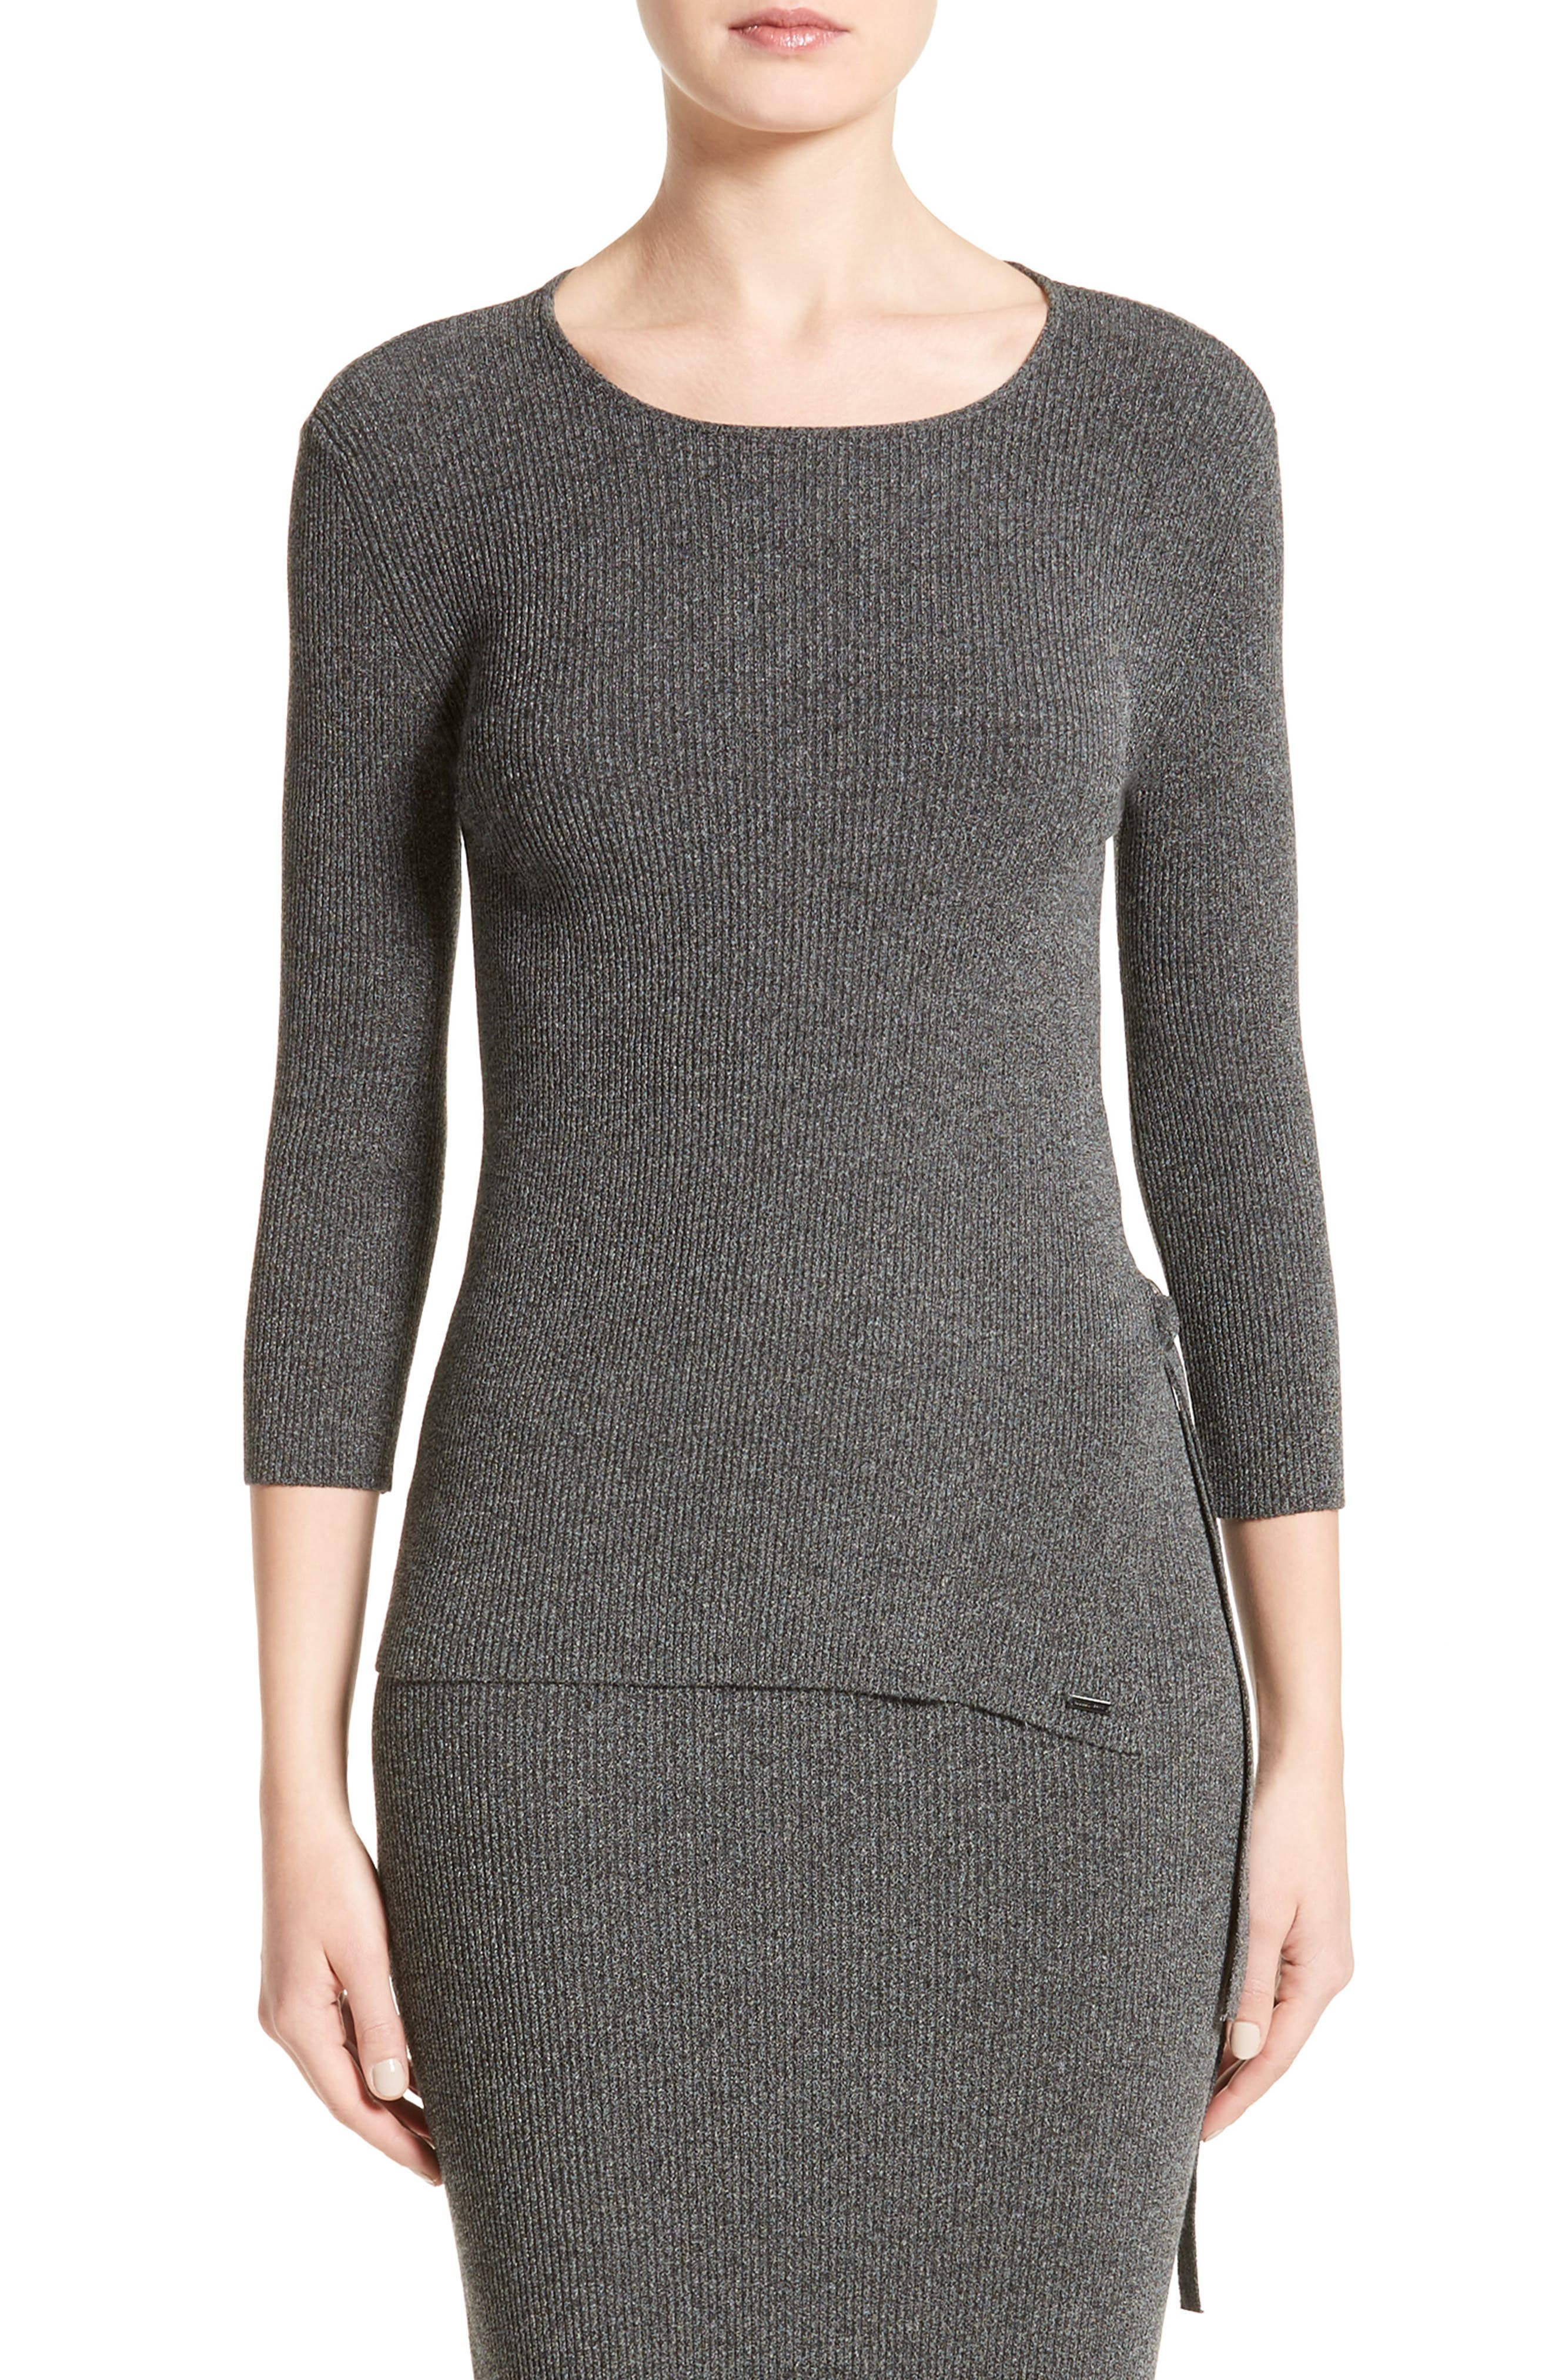 ARMANI COLLEZIONI Armani Jeans Rib Knit D-Ring Sweater